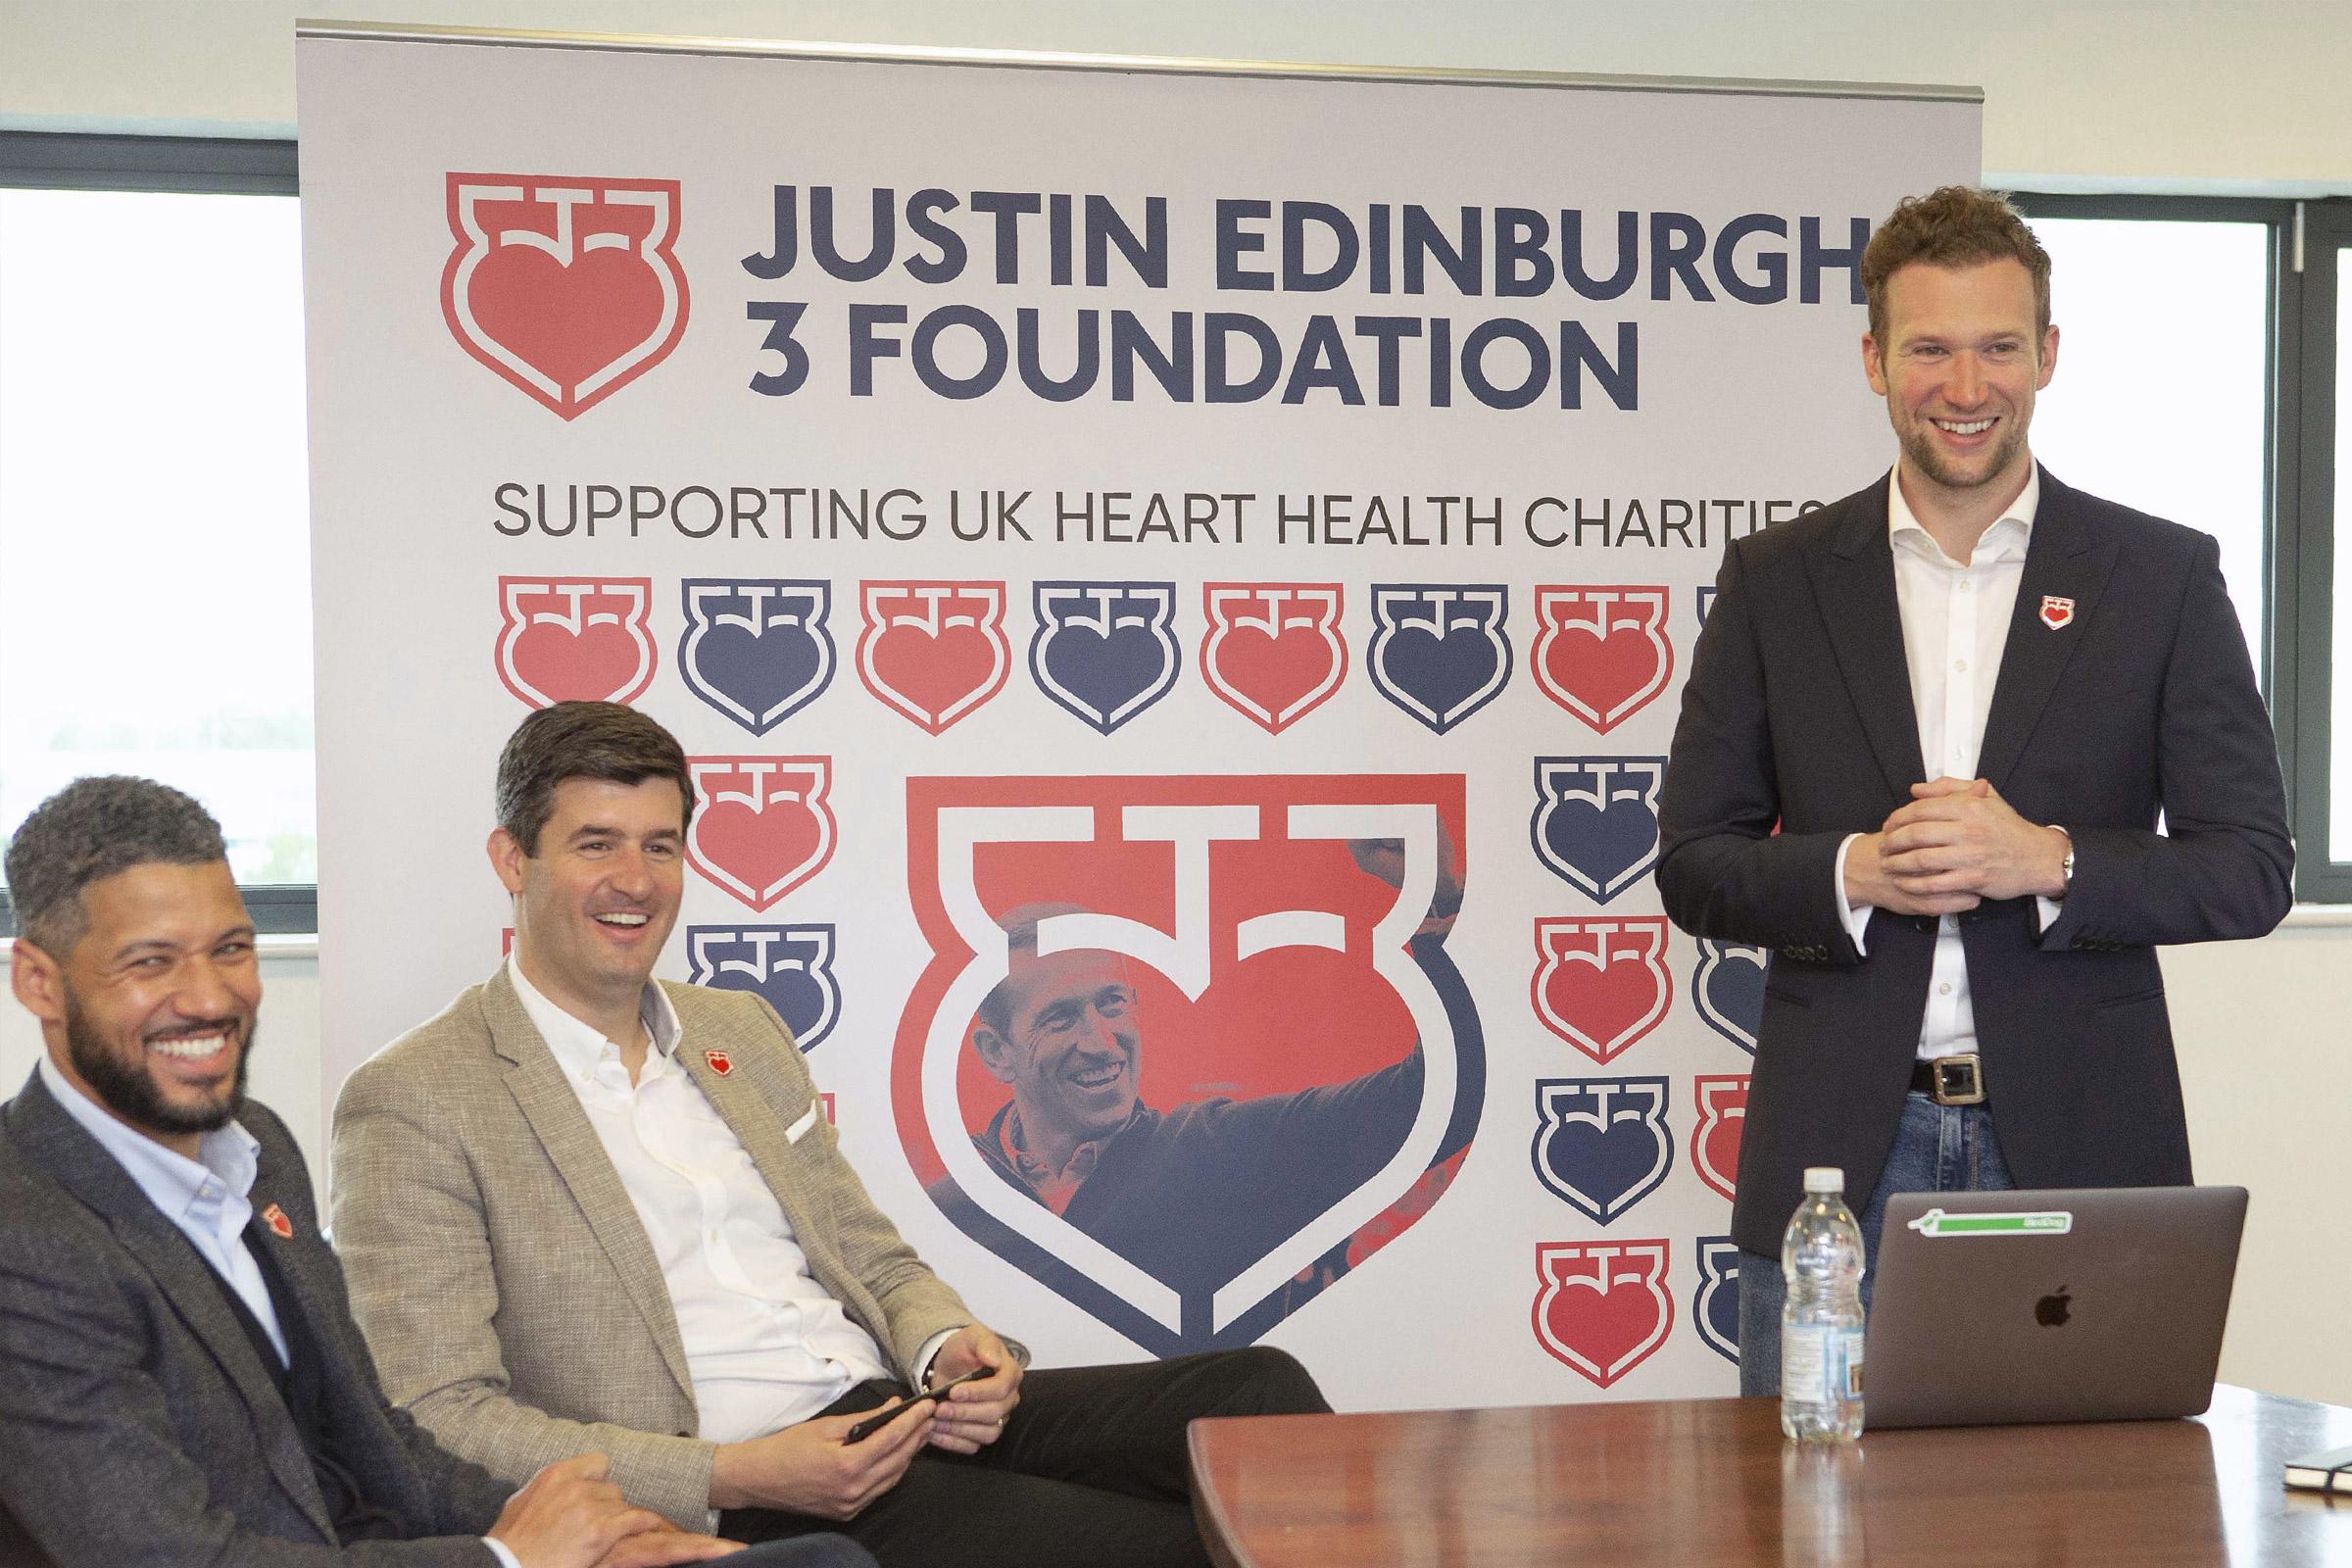 JE3 Foundation Receives Charitable Status